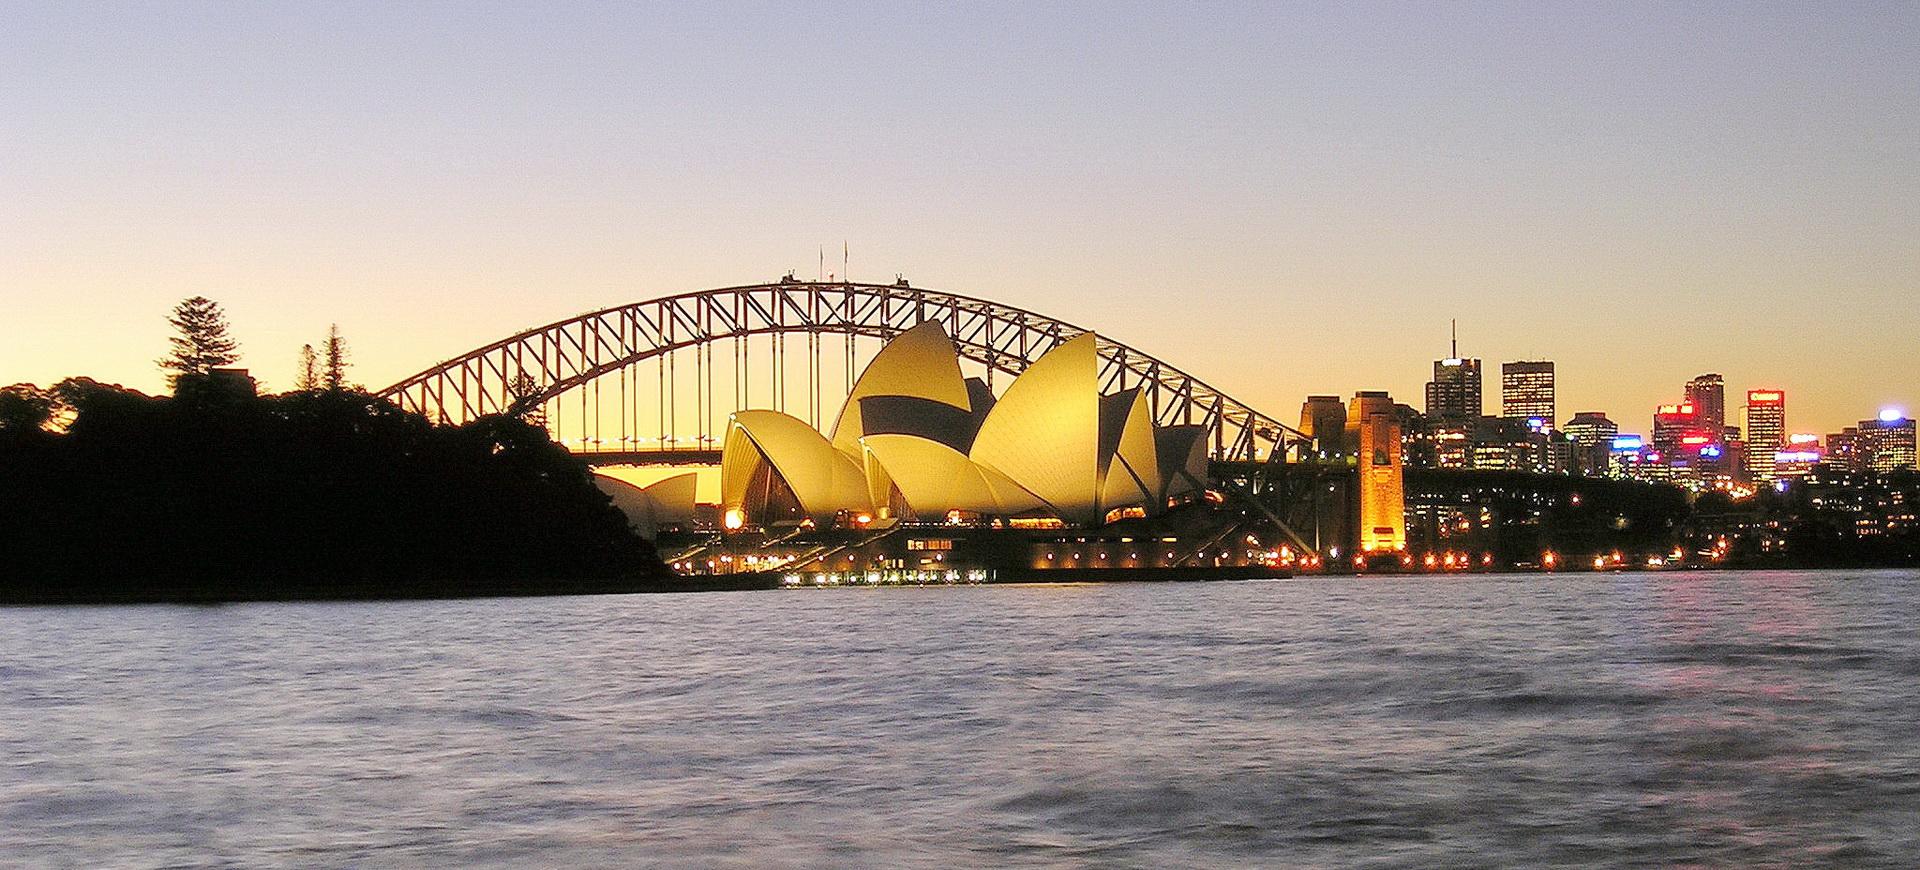 Formalités visa Australie